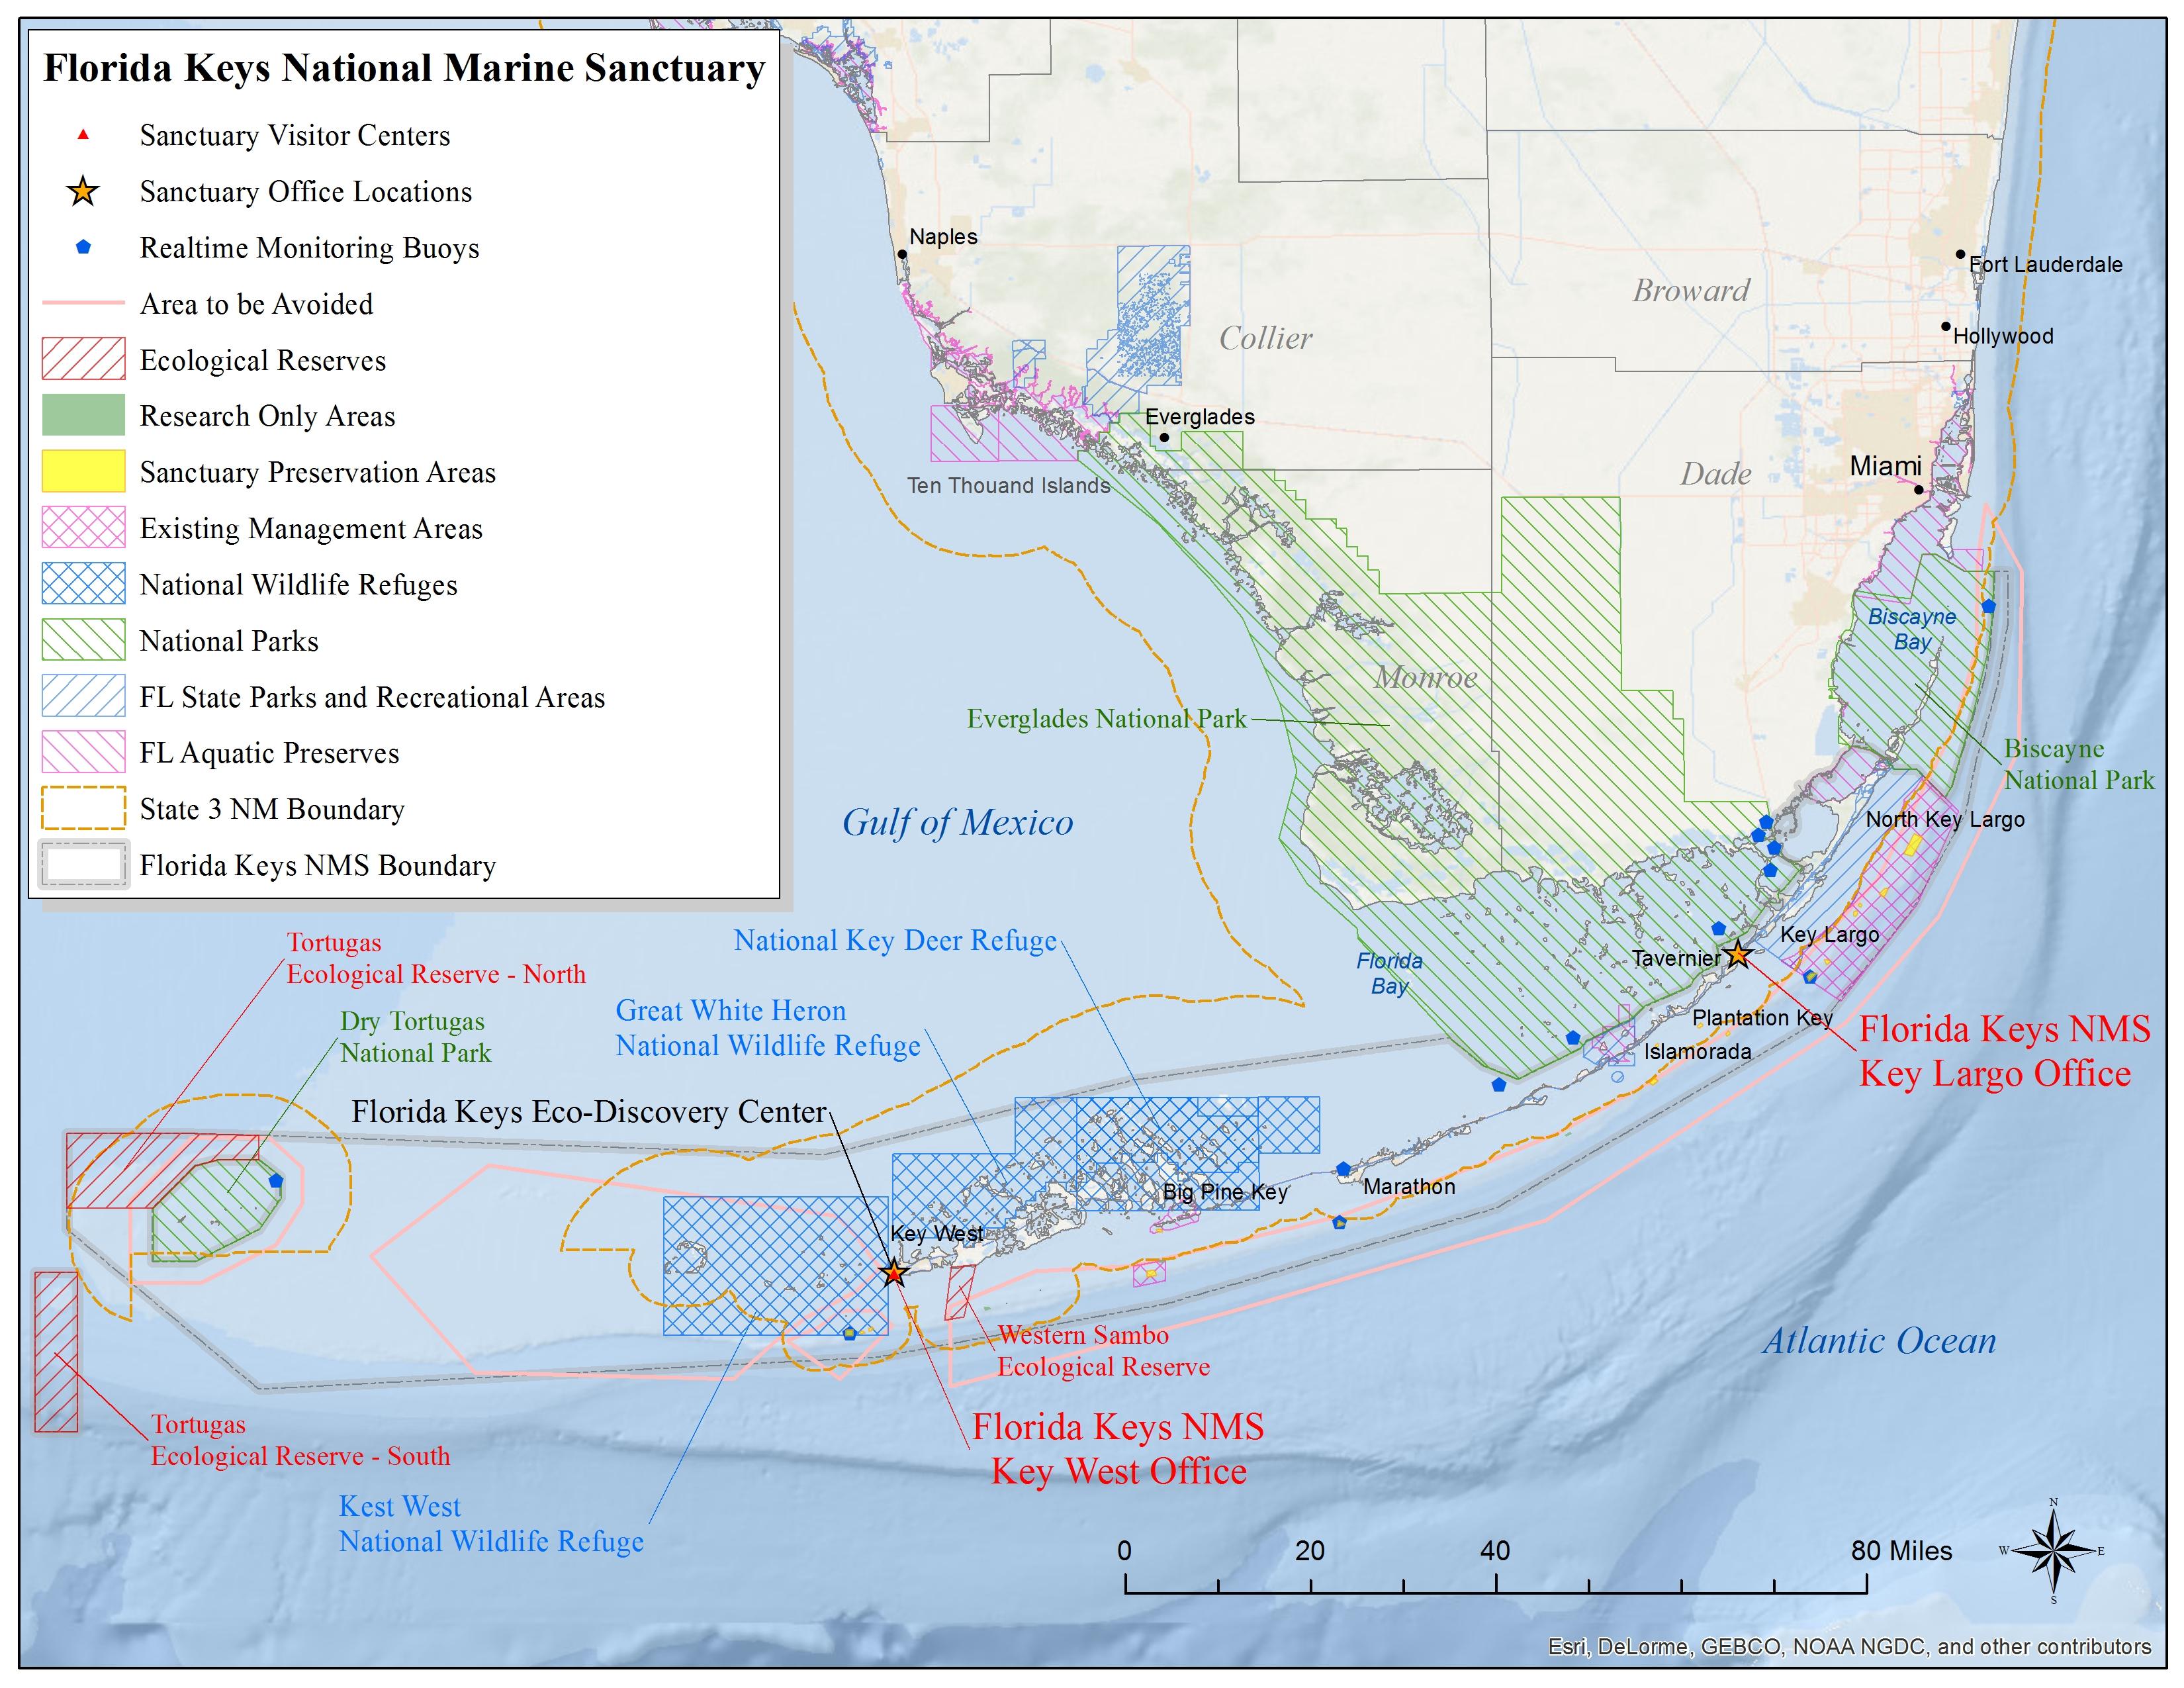 Florida Keys Map.Florida Keys Map National Marine Sanctuaries